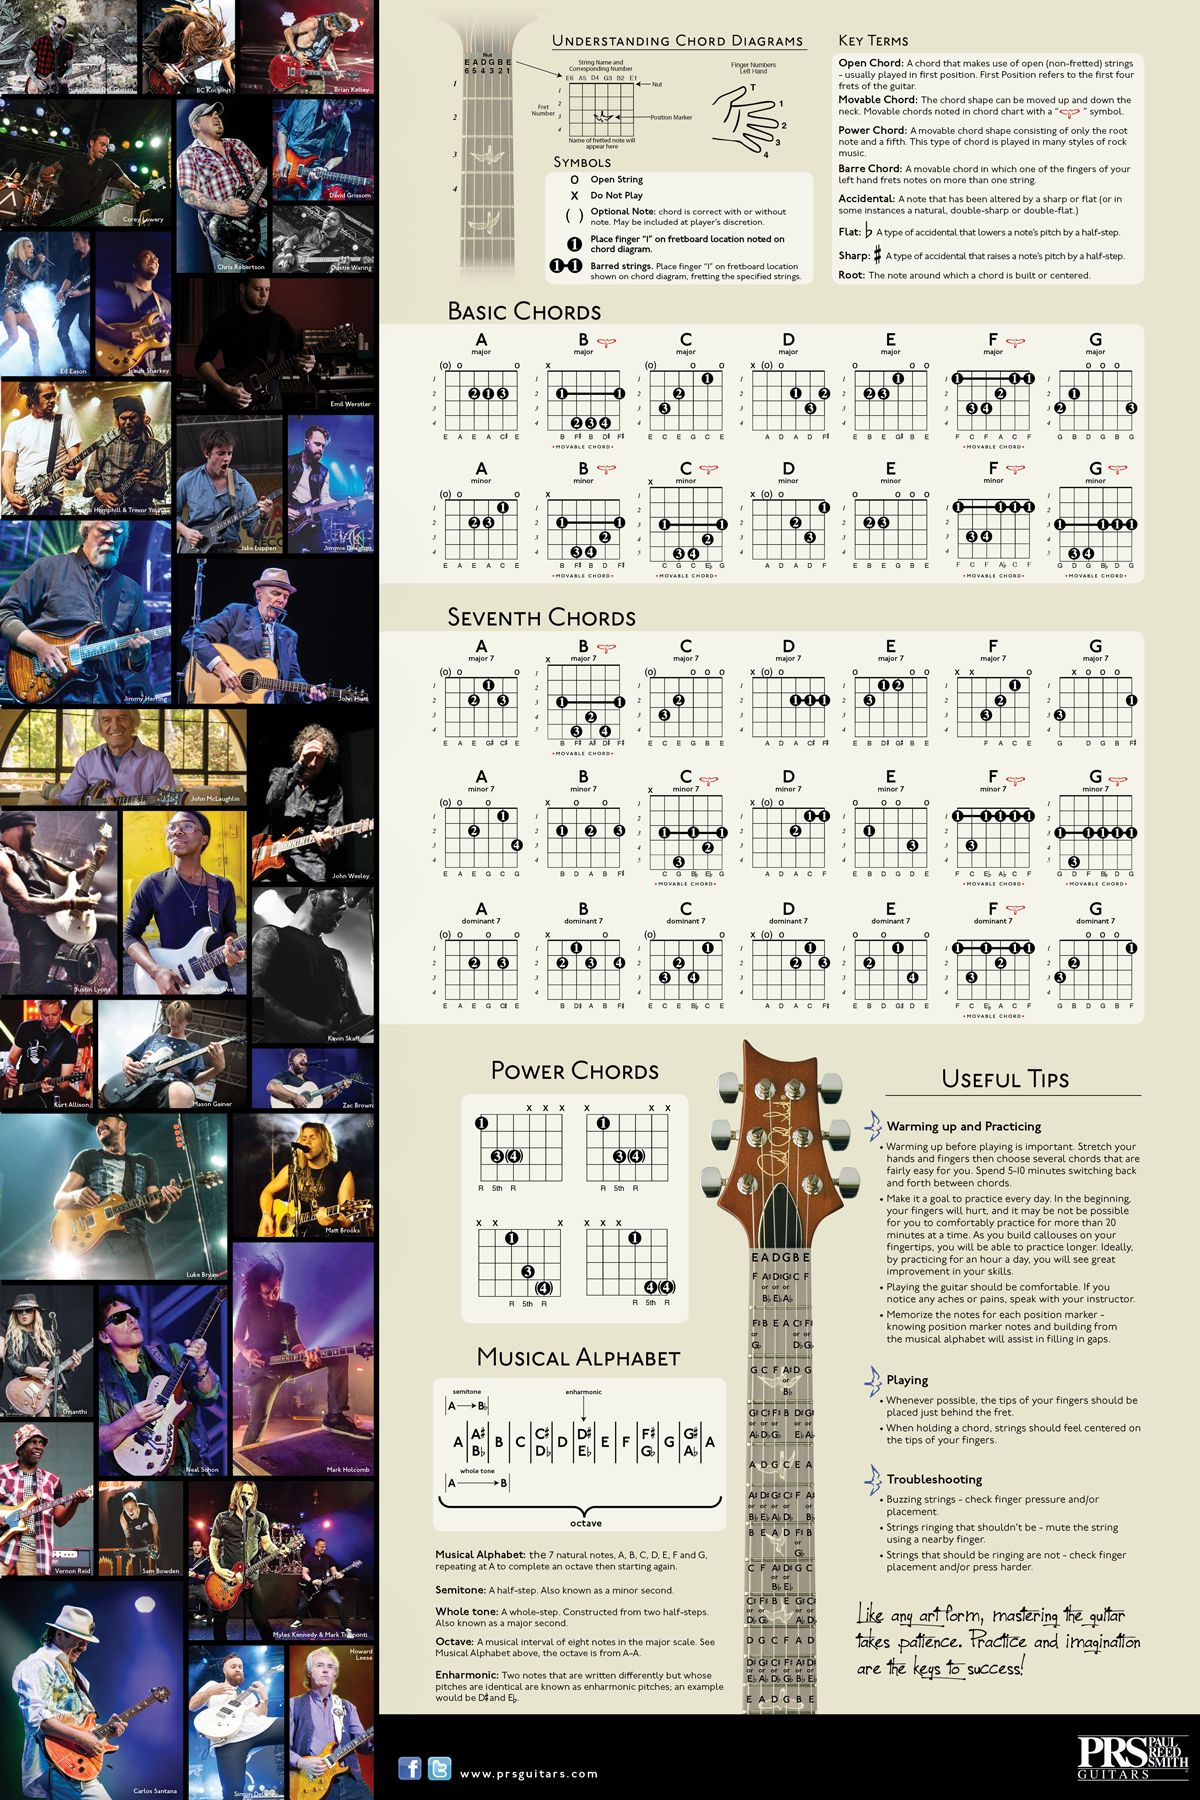 Download The Prs Chord Chart Guitarmusic Stuff Pinterest